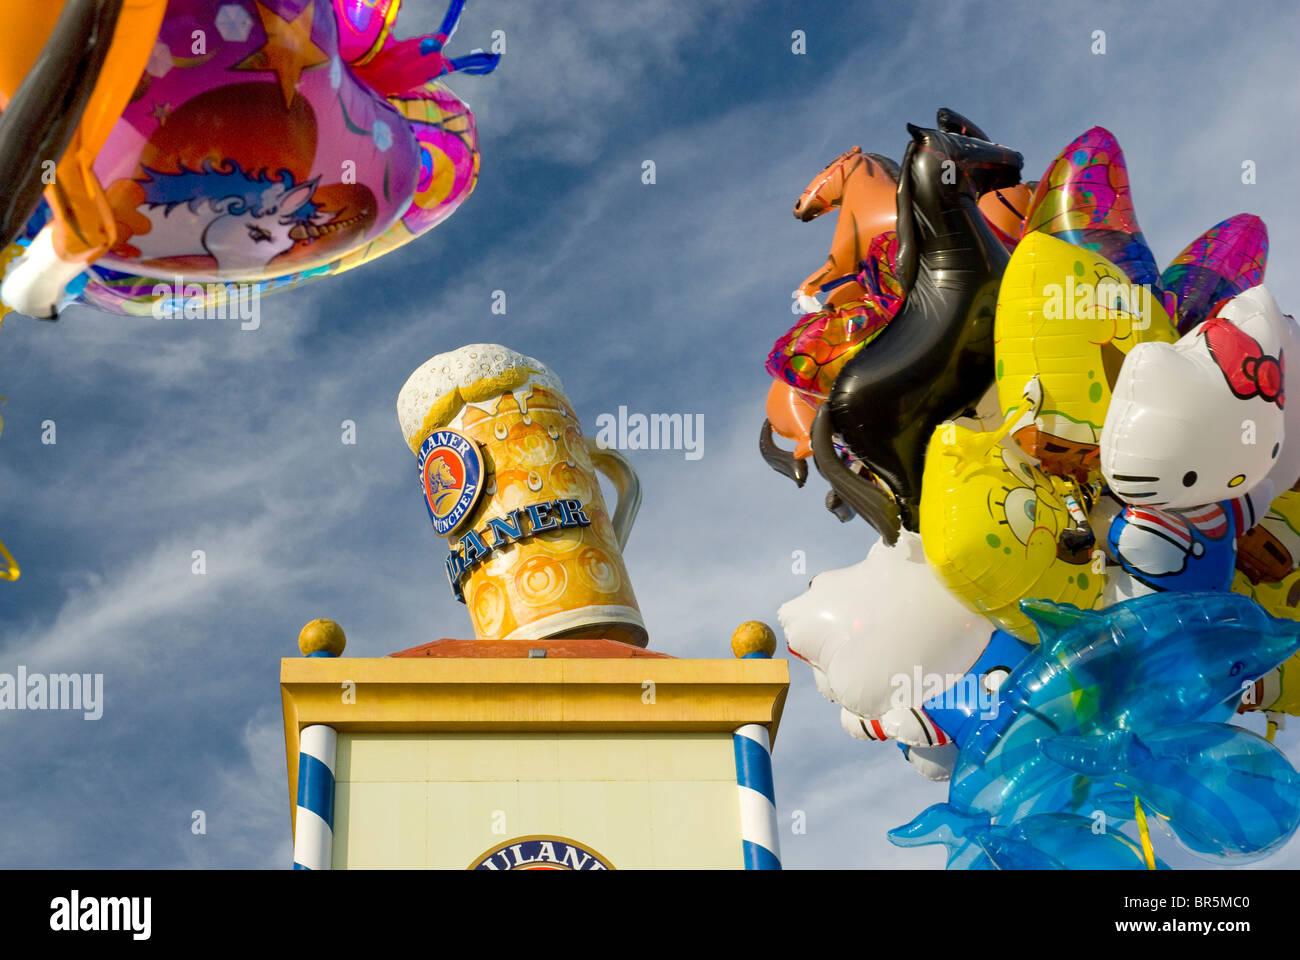 Balloons, advertisment beer stein, Oktoberfest, Munich, Germany, Europe - Stock Image